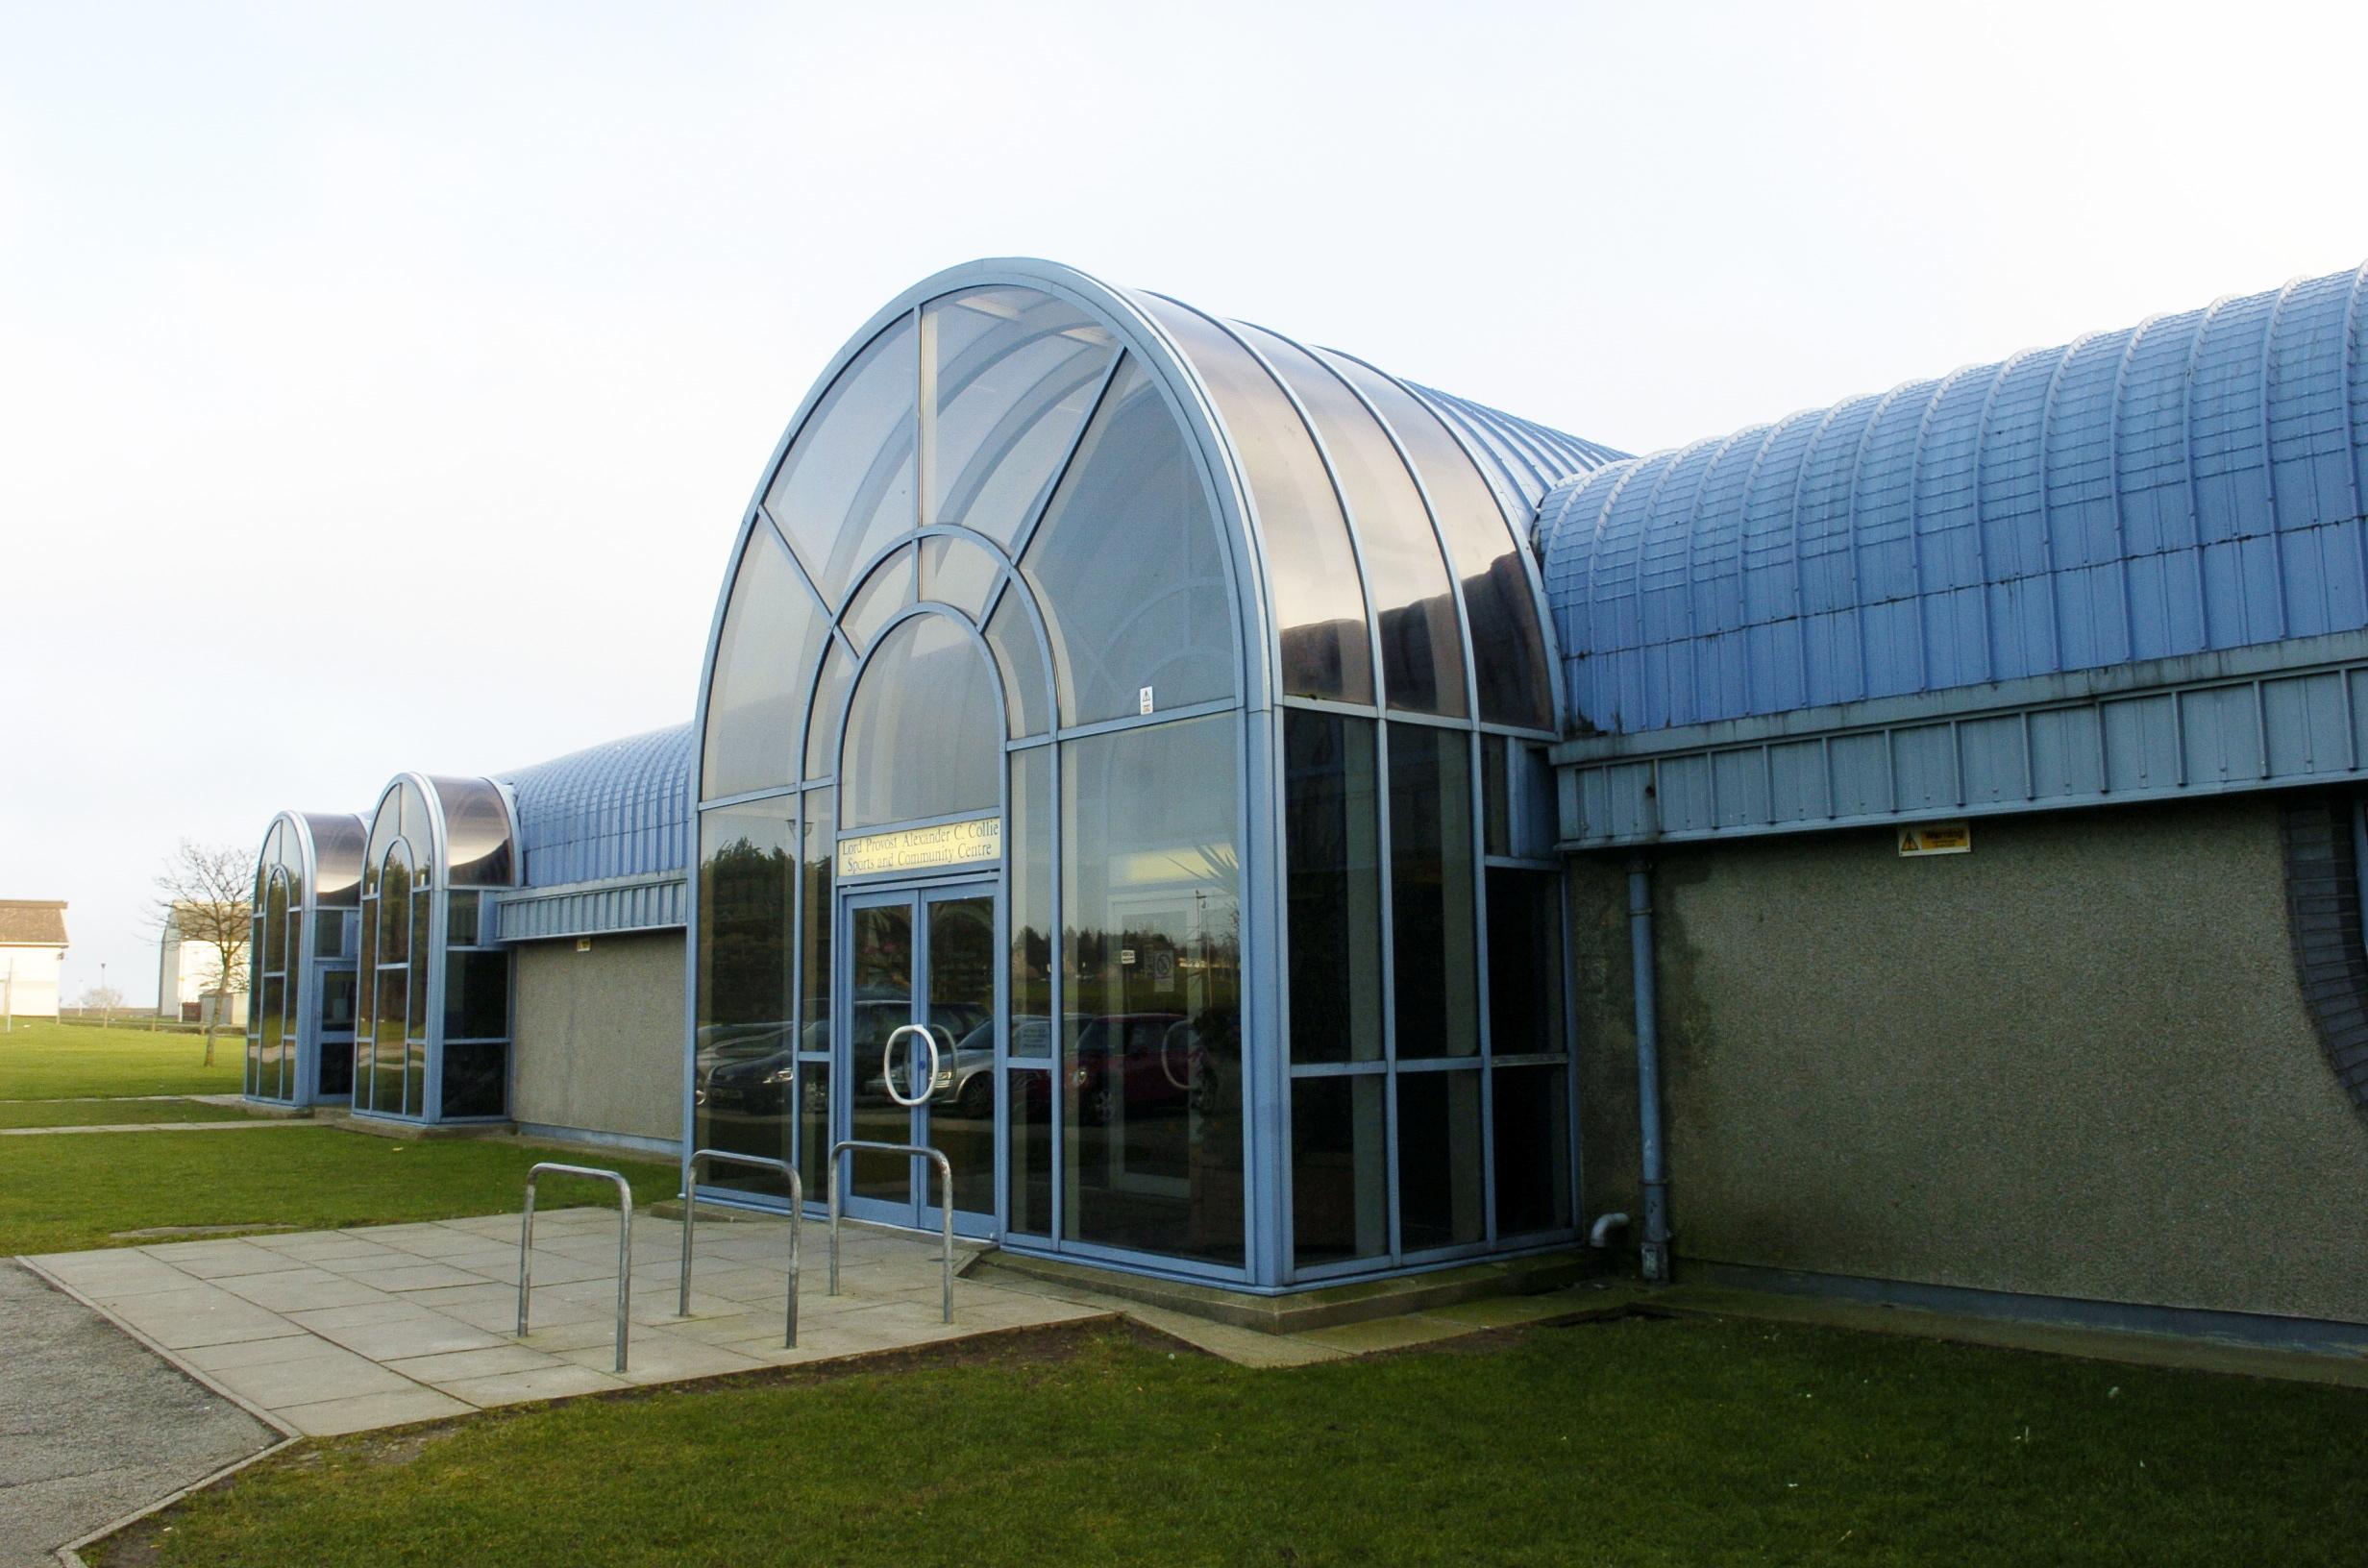 The Alex Collie Sports Centre